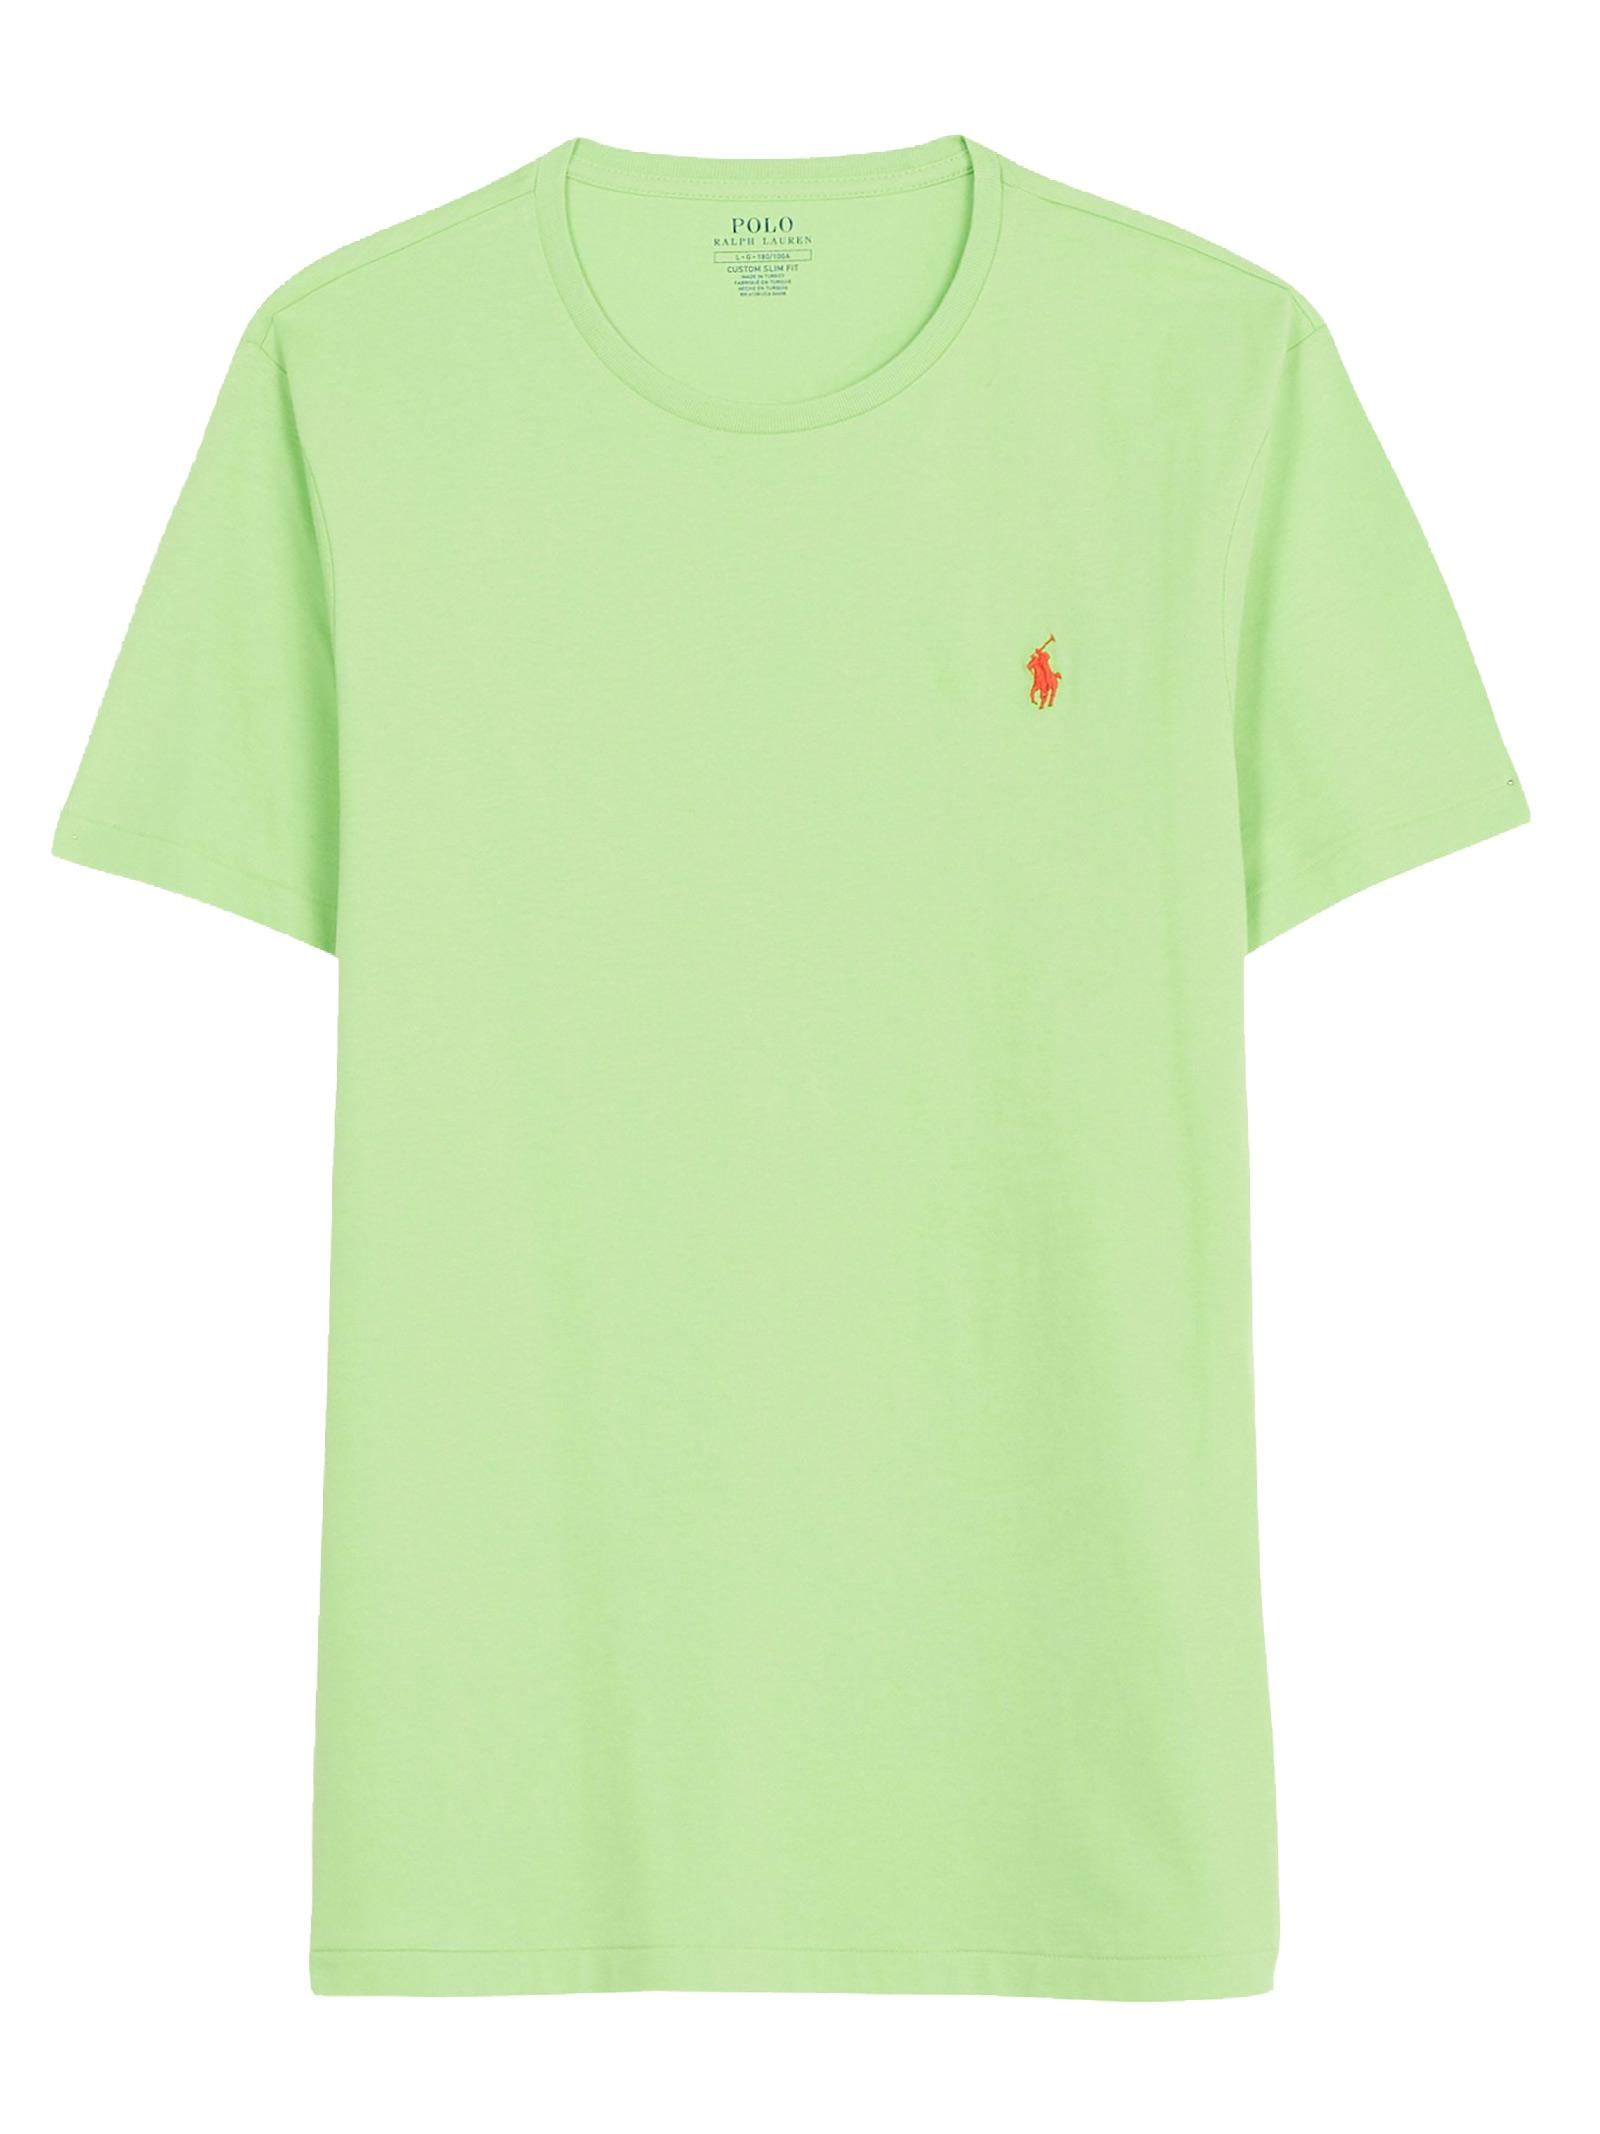 T-shirt verde girocollo slimfit RALPH LAUREN   T-shirt   710-671438215